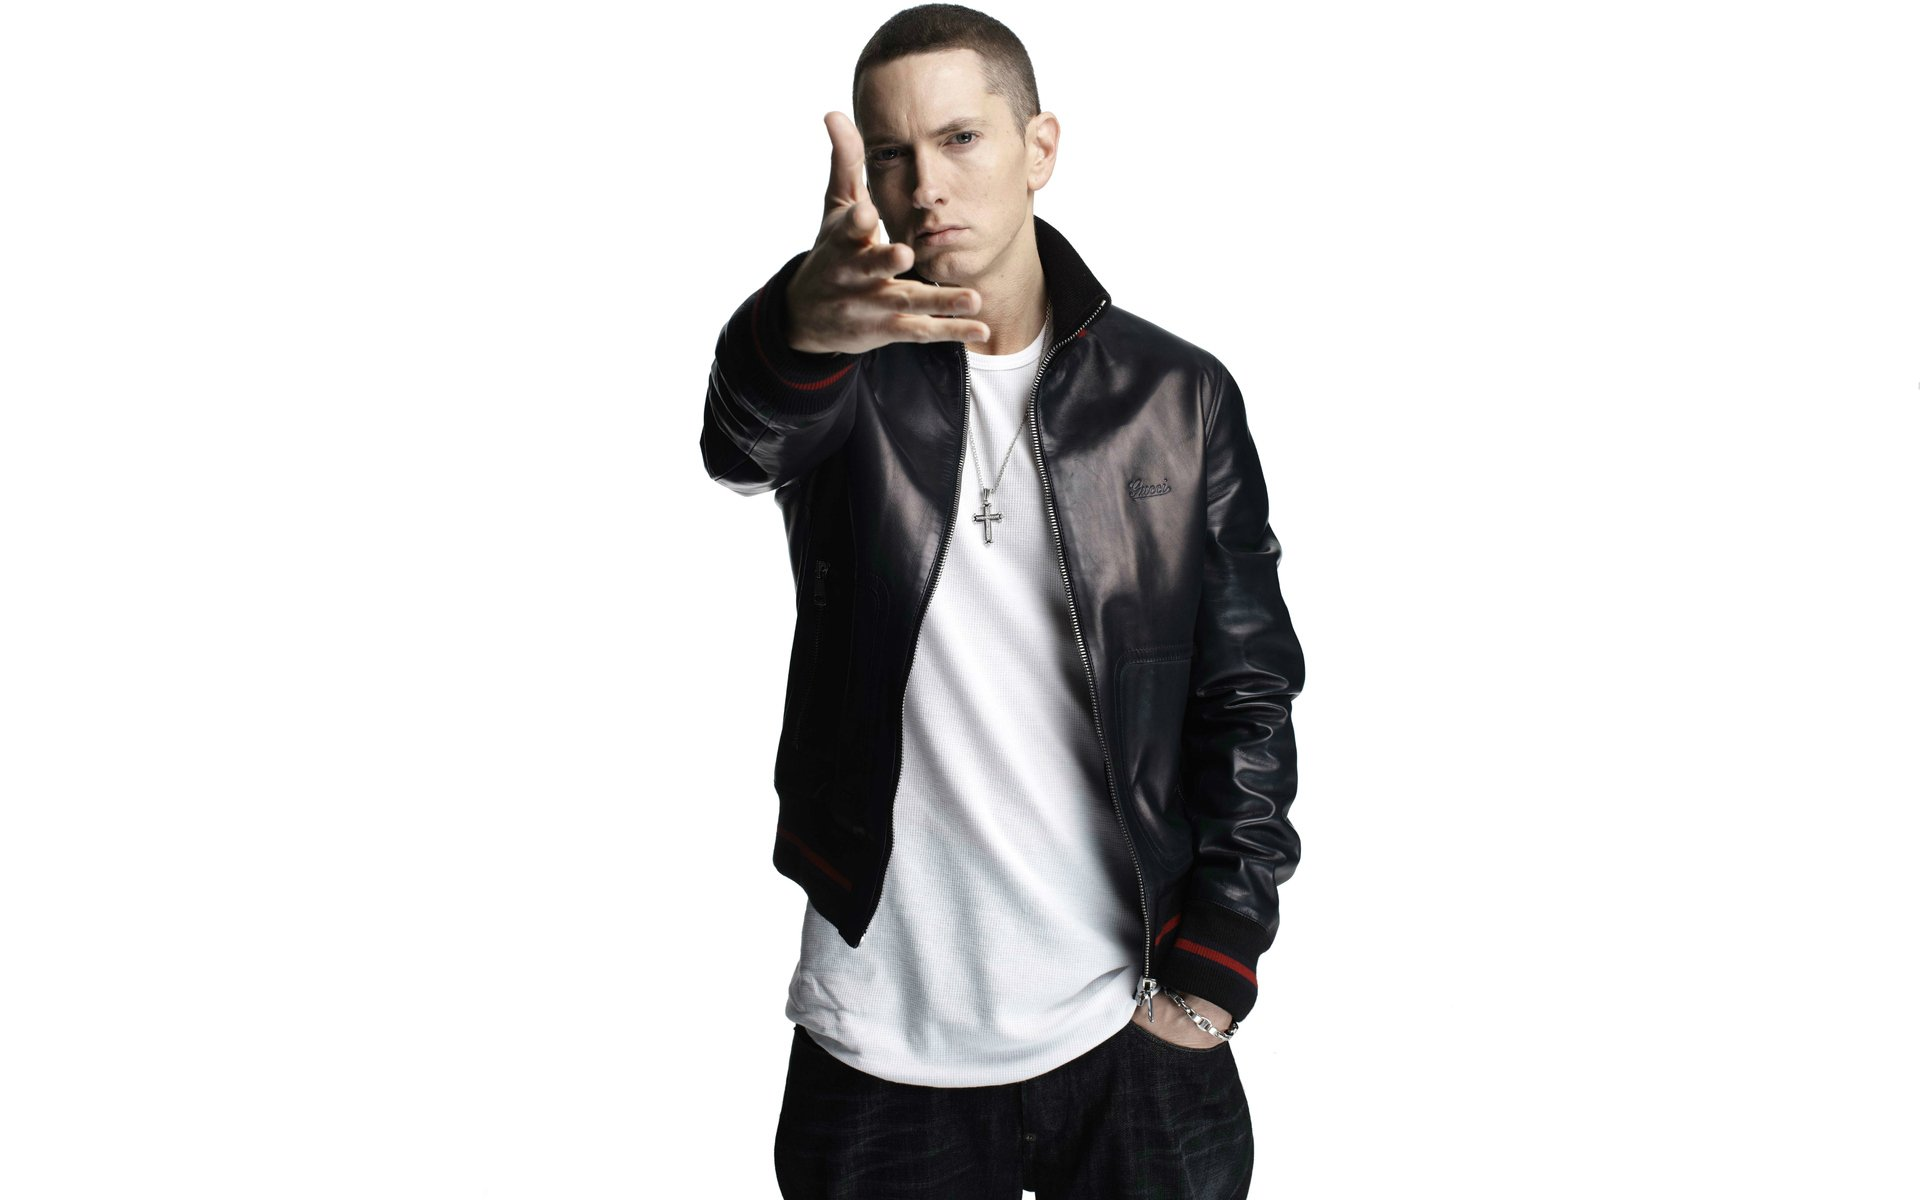 Fantastic Wallpaper Logo Eminem - thumb-1920-333234  You Should Have_31434.jpg